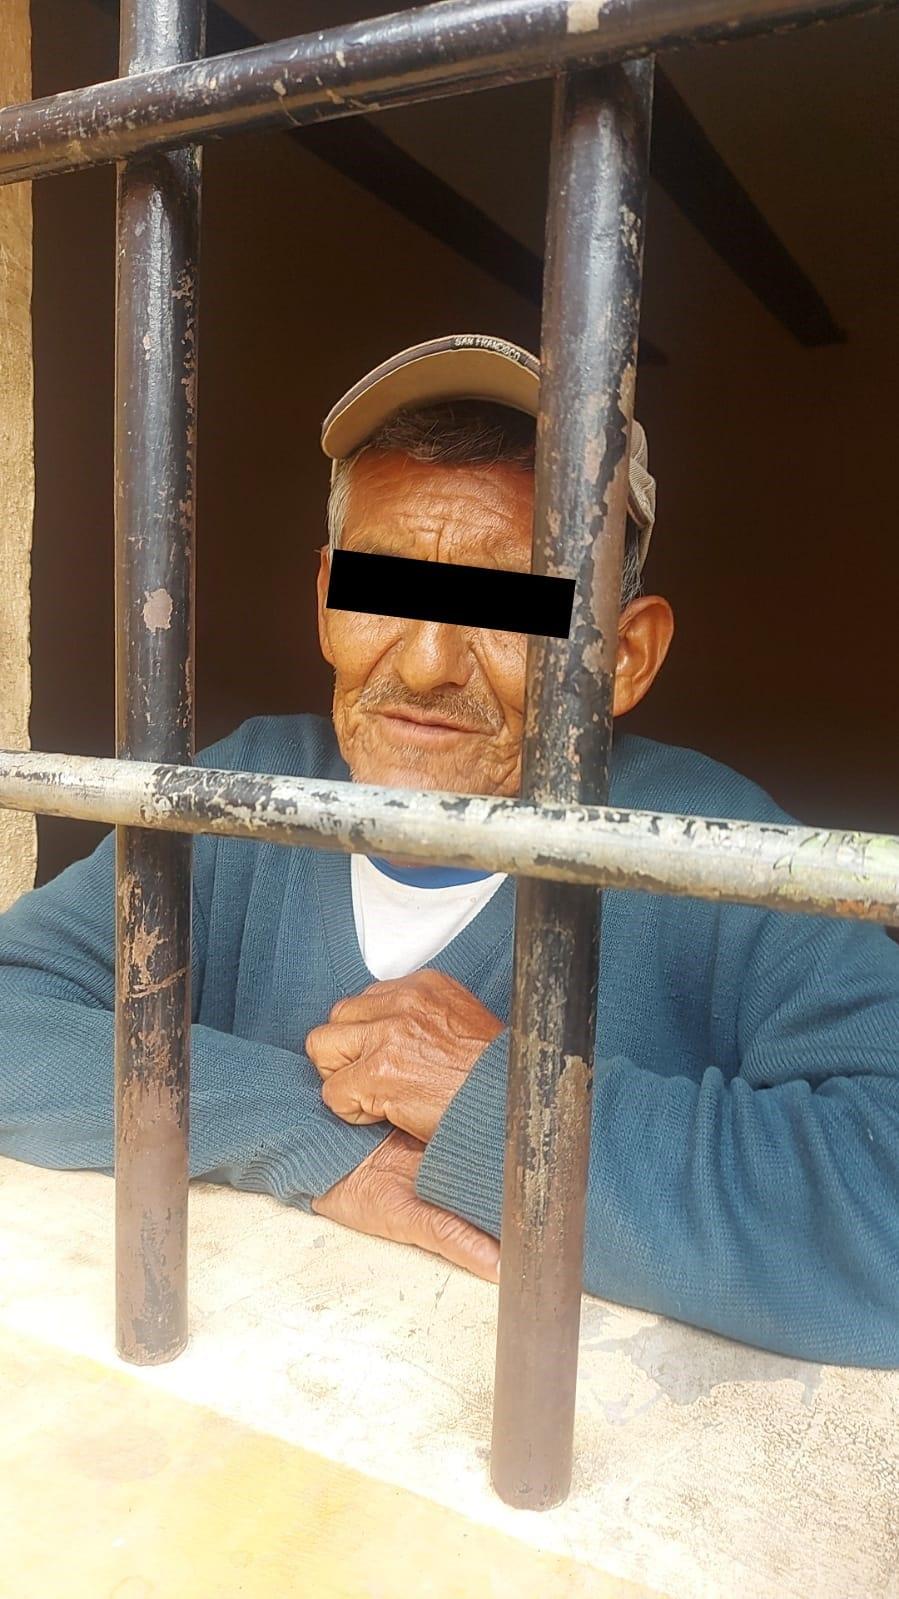 Envían a la cárcel al sujeto que mató a su concubina con una escopeta